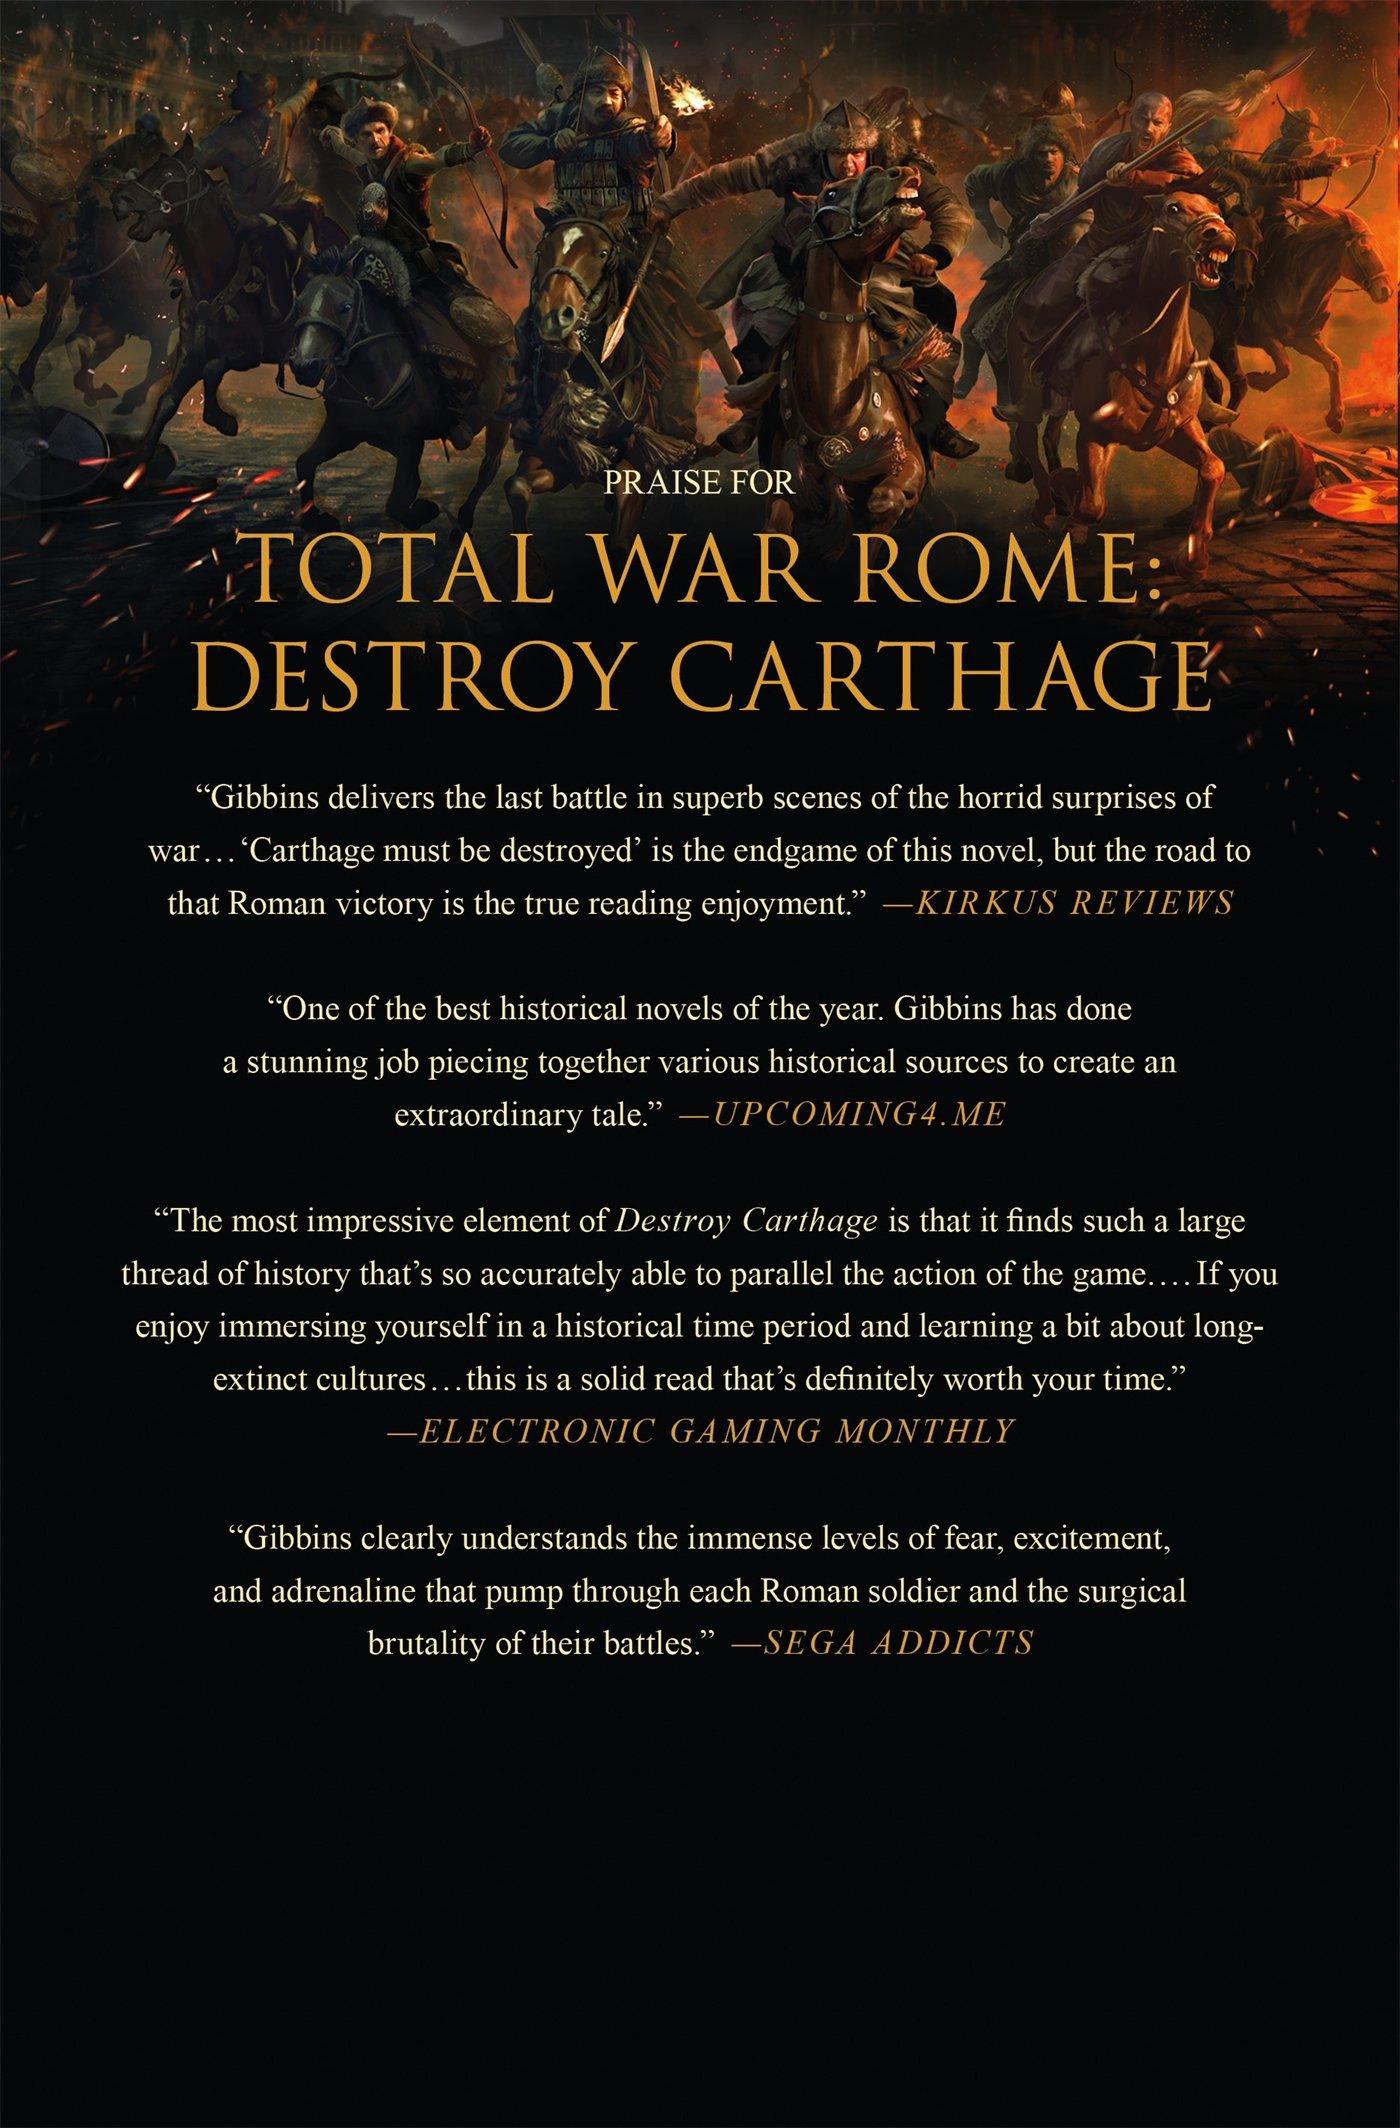 The Sword Of Attila: A Total War Novel (total War Rome): Amazon:  David Gibbins: 9781250038951: Books